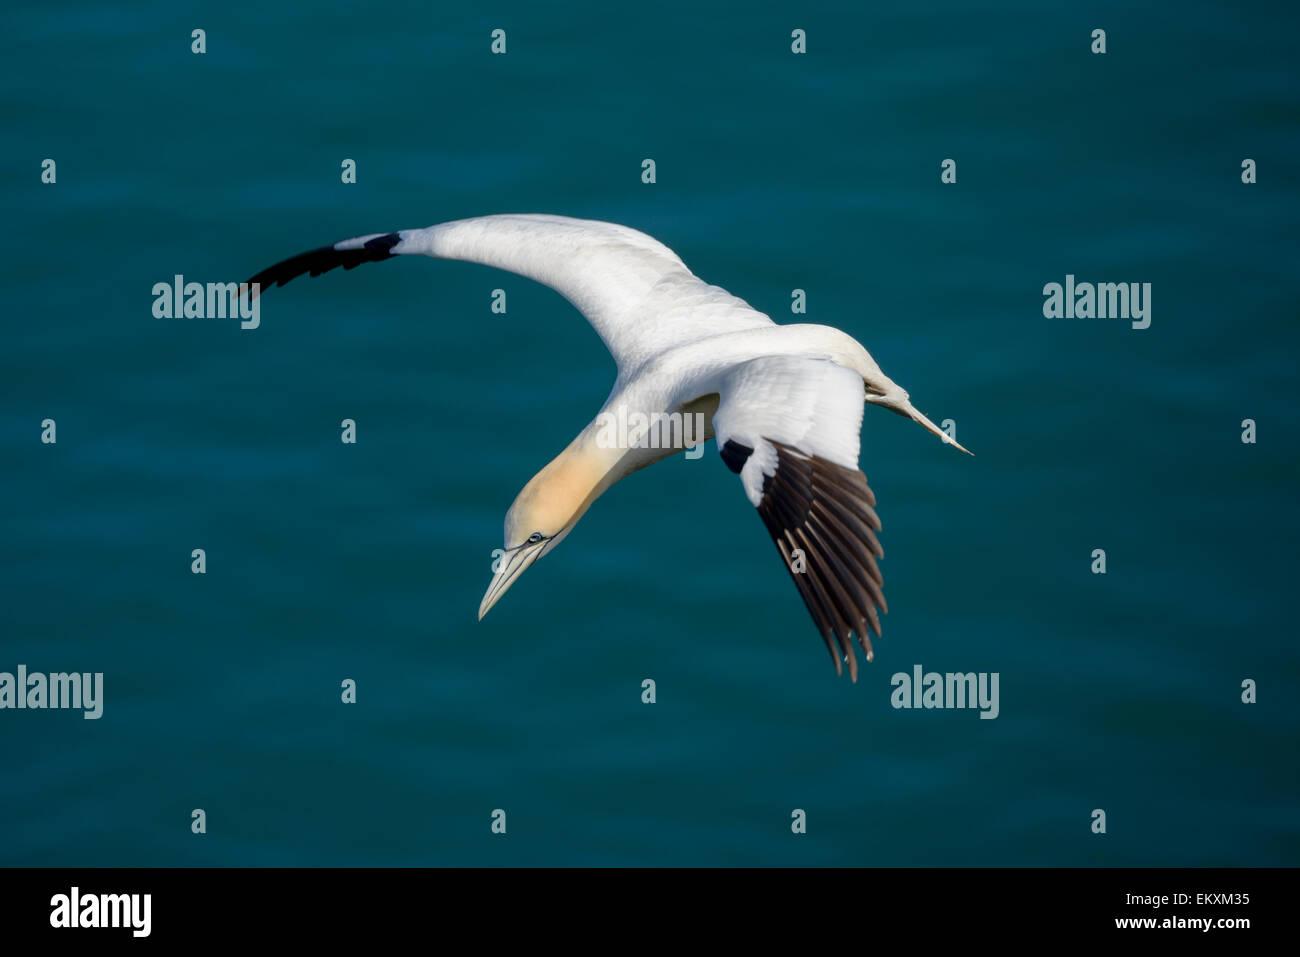 Uno un singolo northern gannet in volo sopra un azzurro-verde del mare del Nord Oceano. Foto Stock